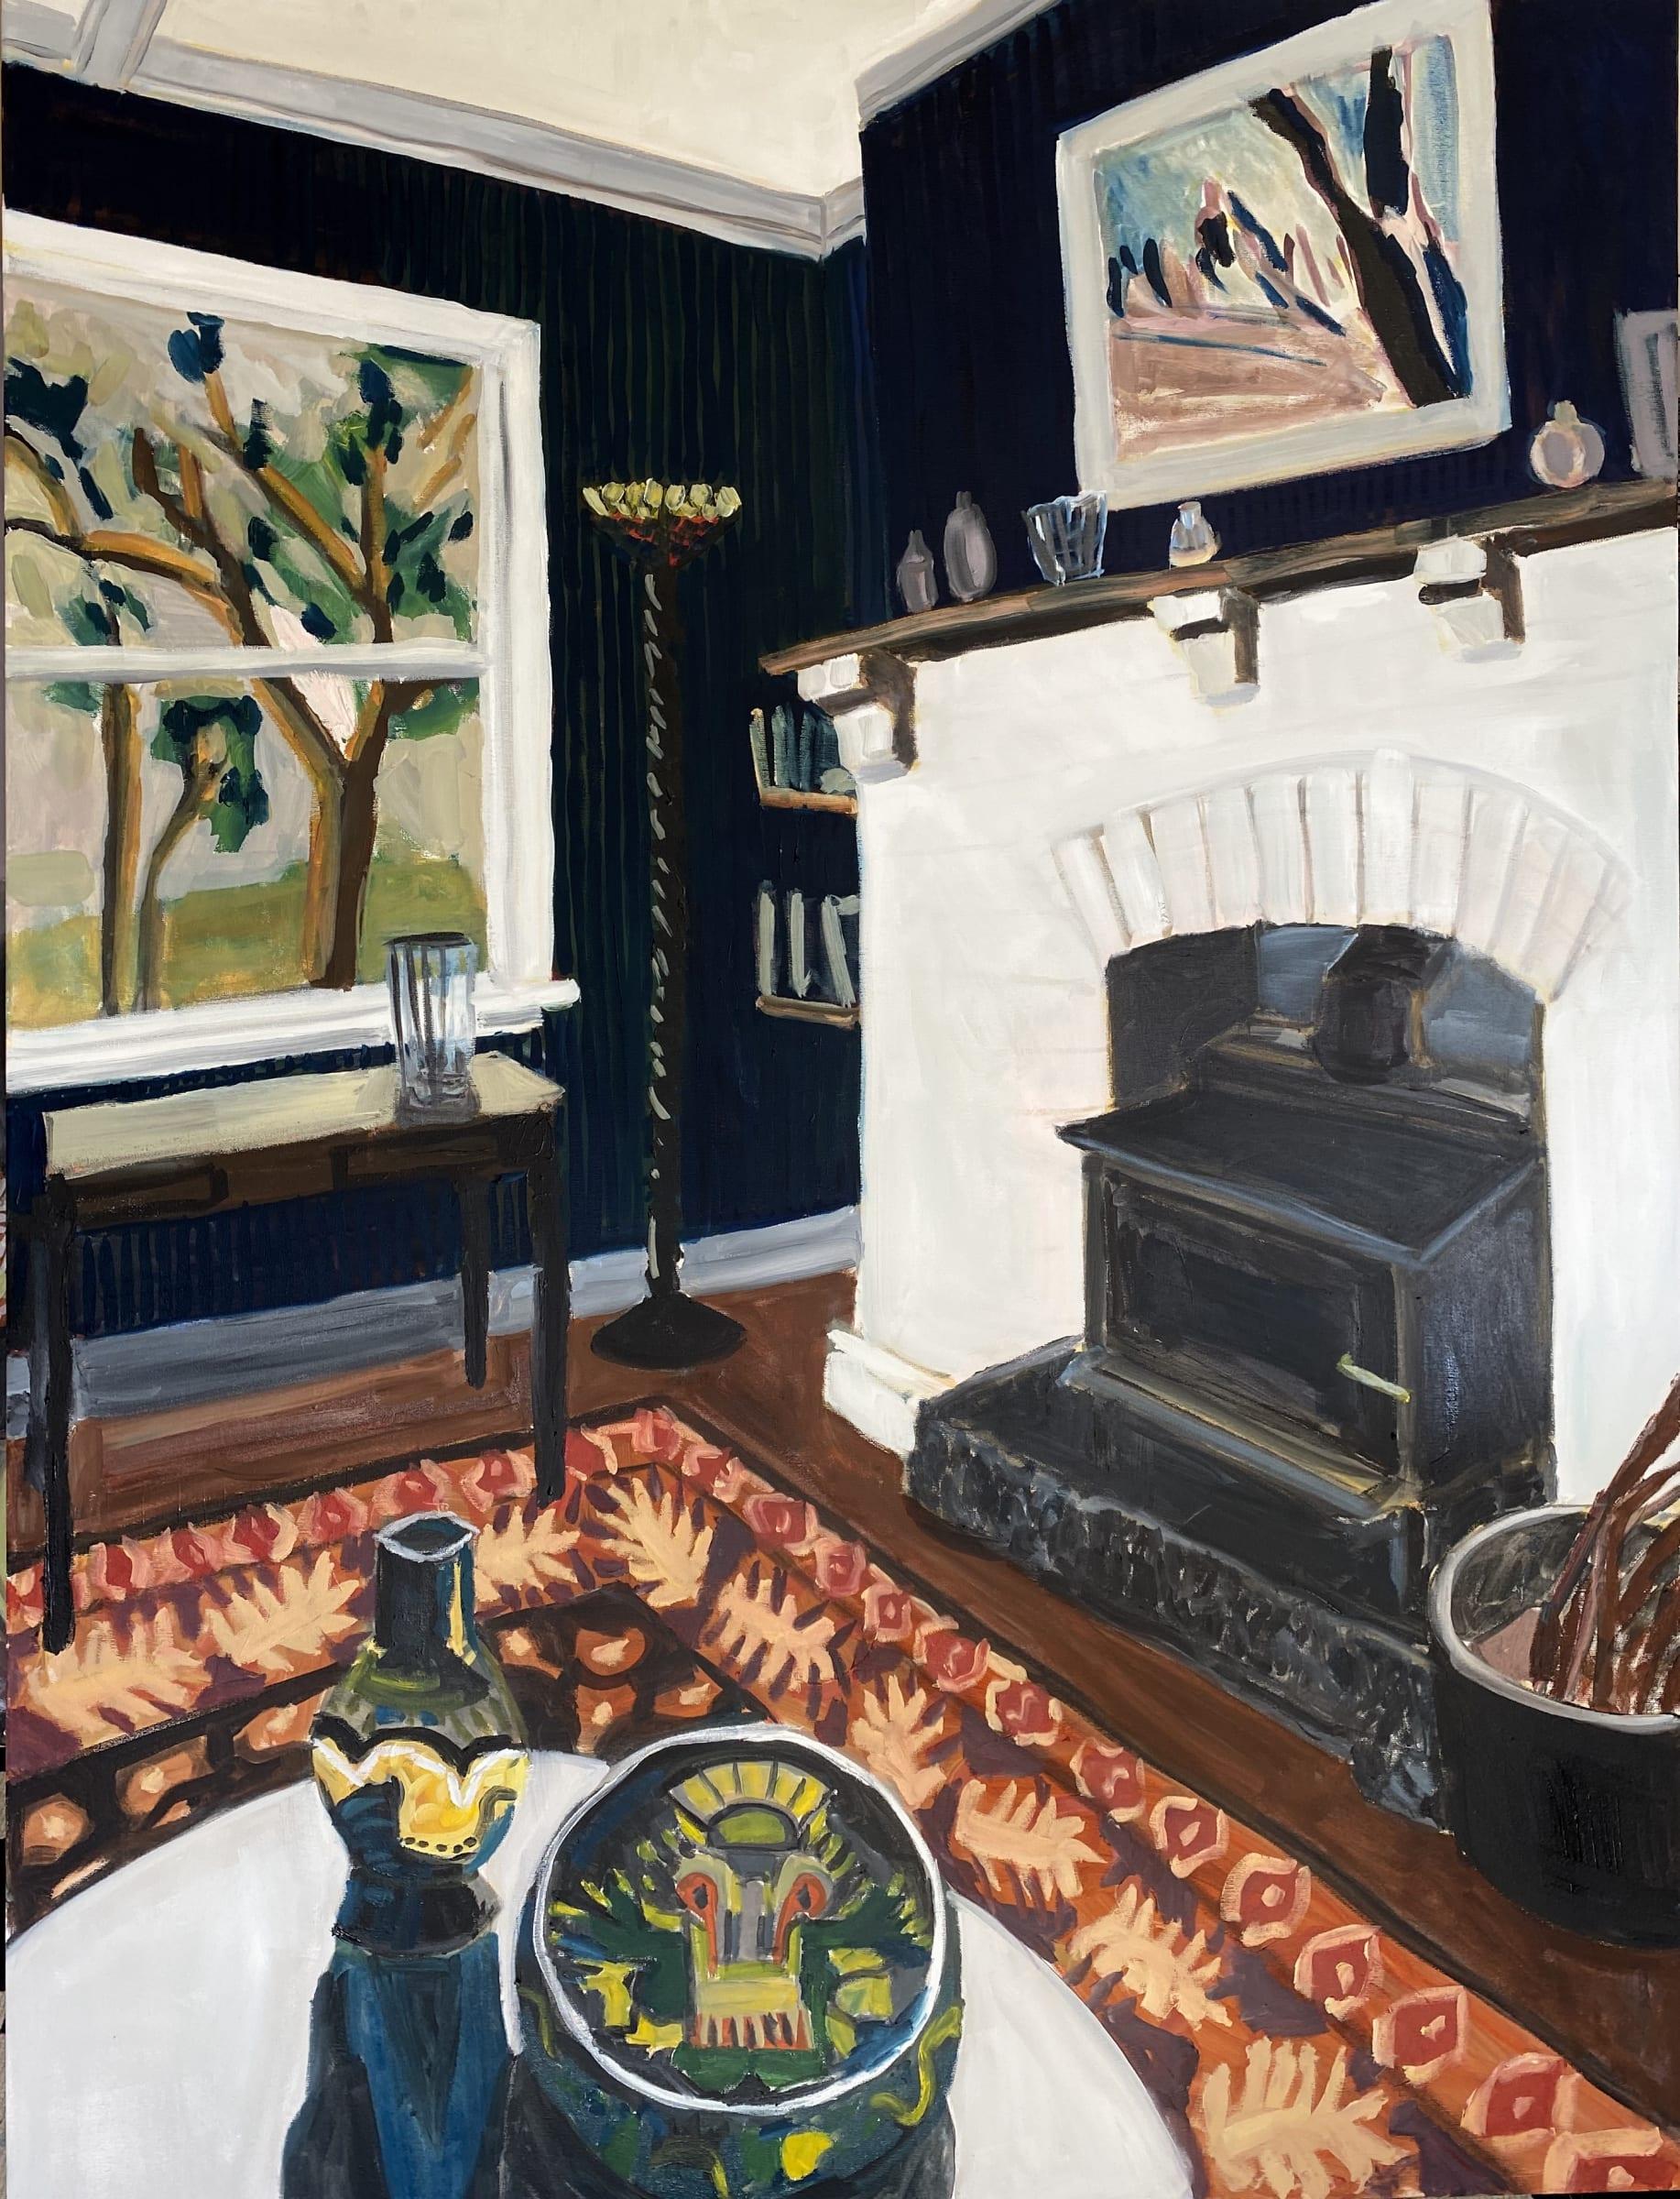 "<span class=""link fancybox-details-link""><a href=""/artists/88-kate-nielsen/works/1250-kate-nielsen-living-room-with-orange-rug/"">View Detail Page</a></span><div class=""artist""><strong>Kate Nielsen</strong></div> <div class=""title""><em>Living Room With Orange Rug</em></div> <div class=""medium"">Oil on canvas</div> <div class=""dimensions"">48 x 36 inches (framed in light Tasmanian oak)</div>"